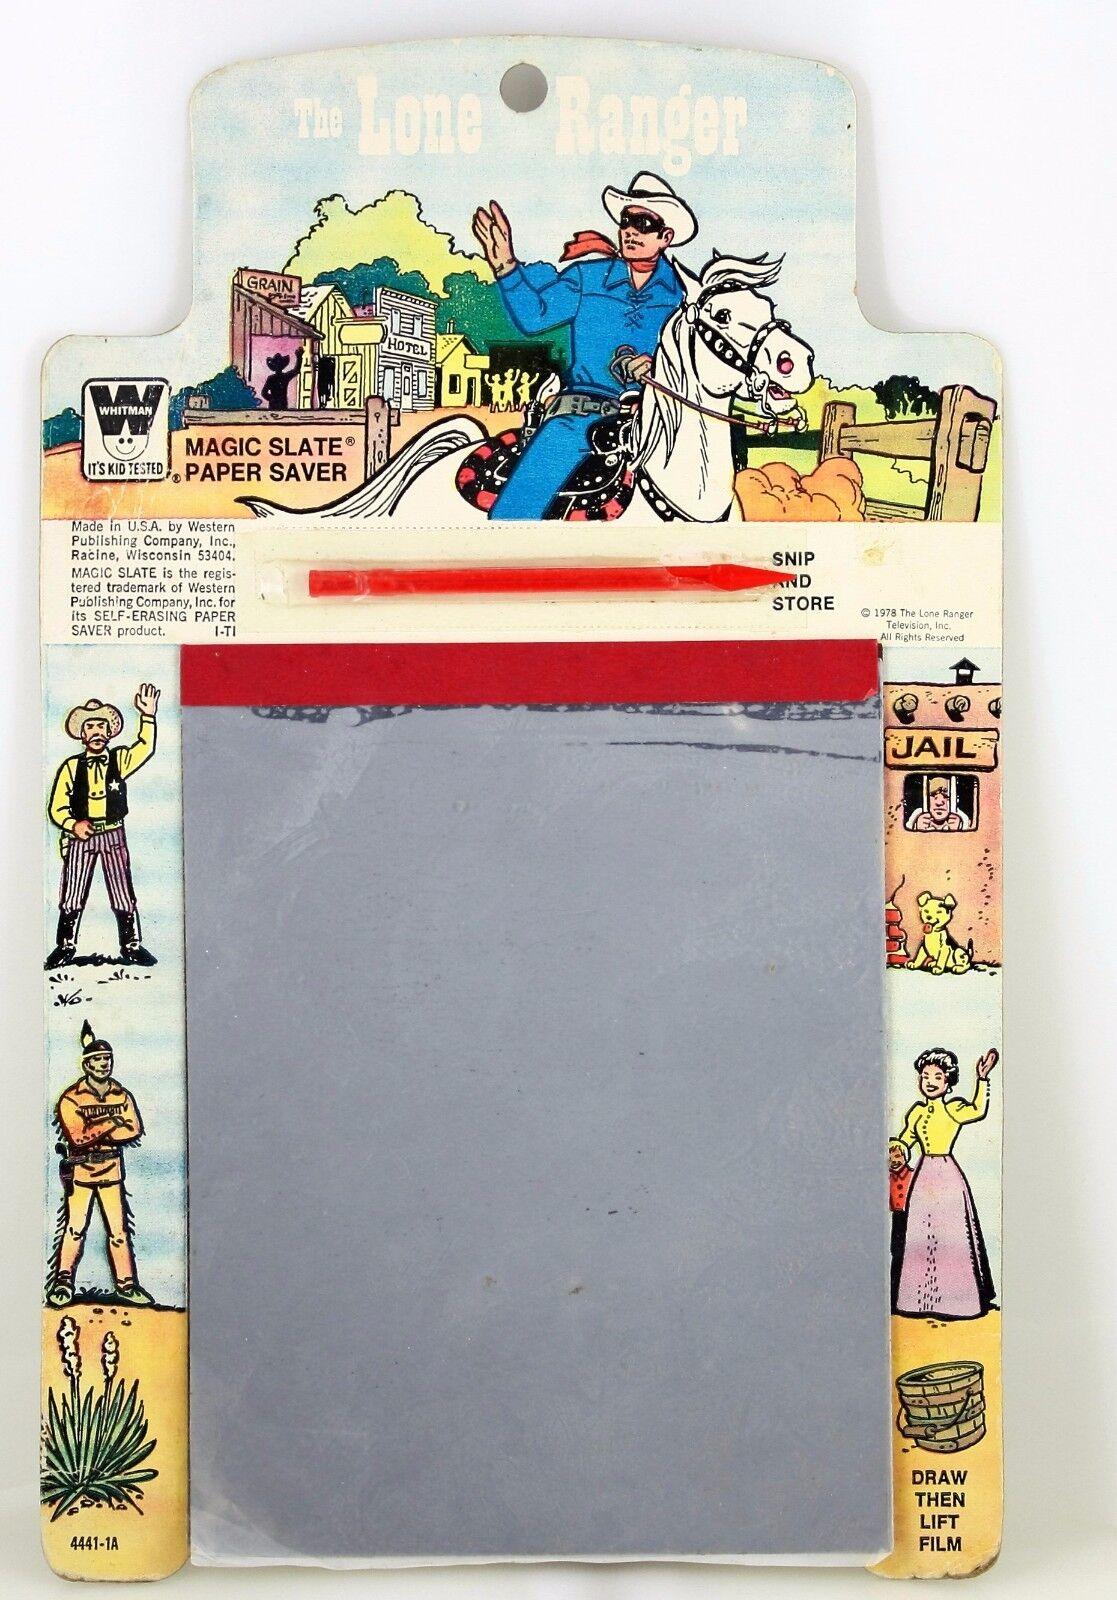 1978 The Lone Ranger Magic Slate Paper Saver